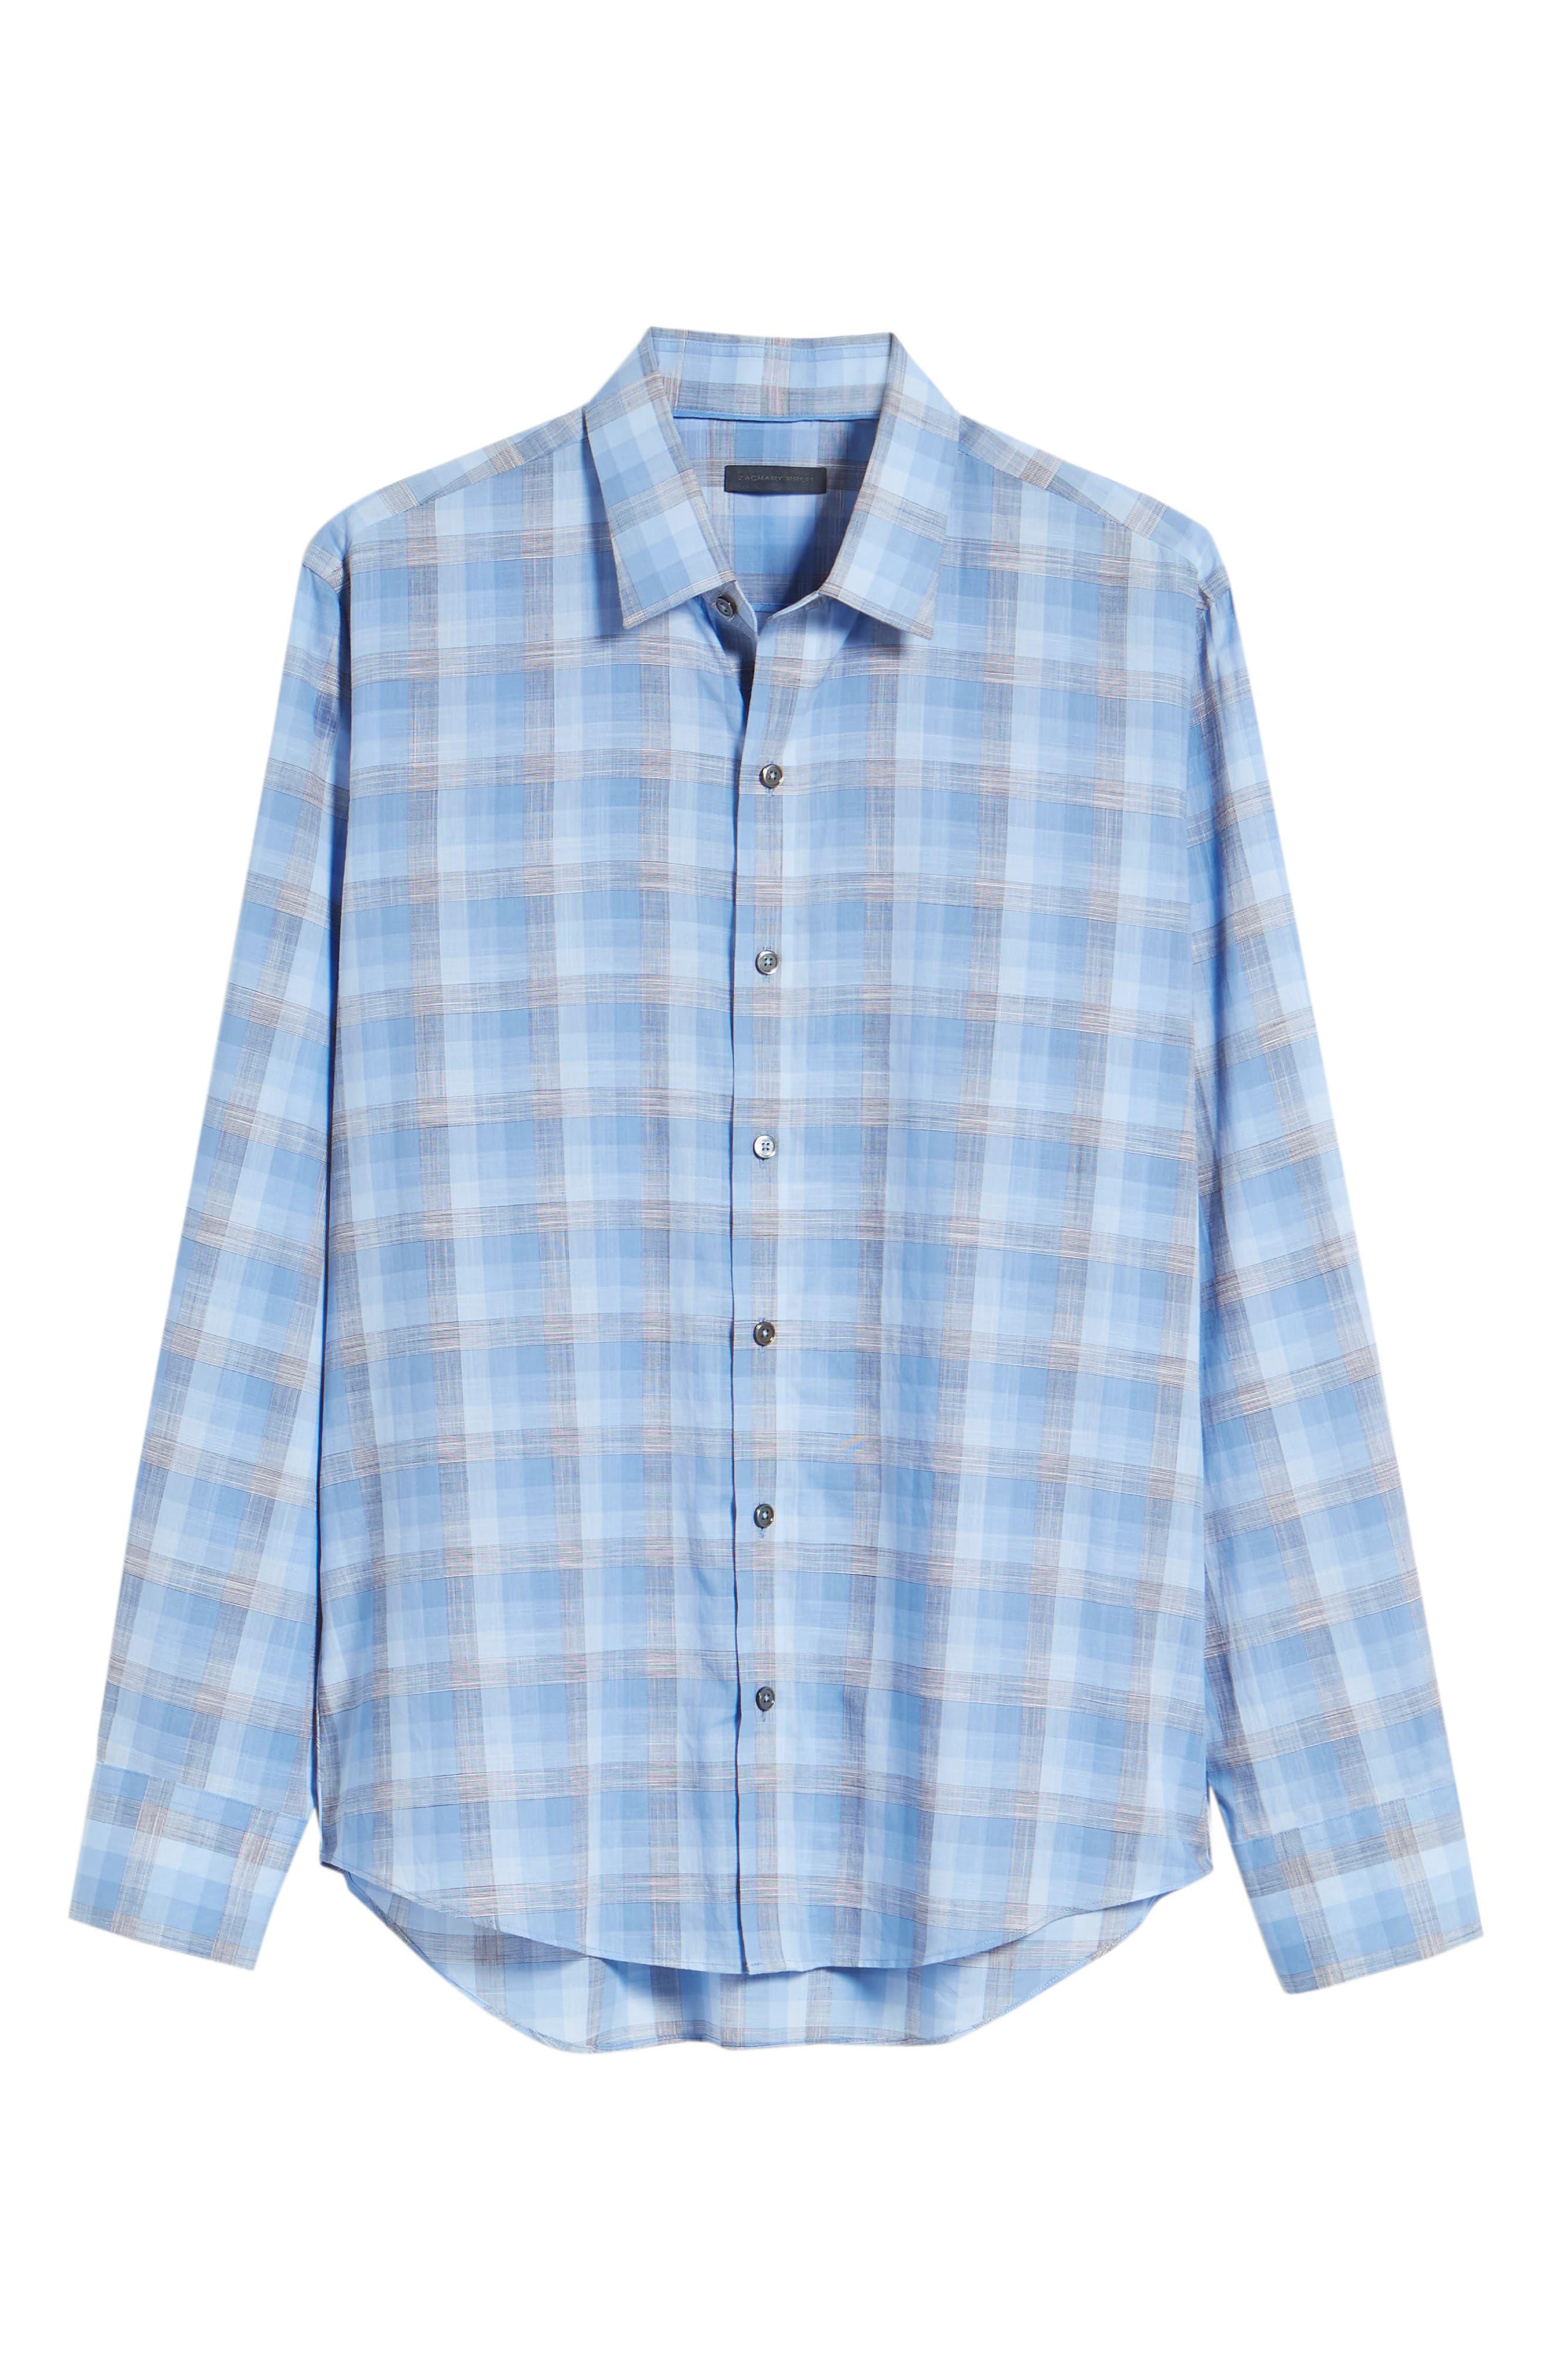 Asim Regular Fit Sport Shirt,                             Alternate thumbnail 6, color,                             422